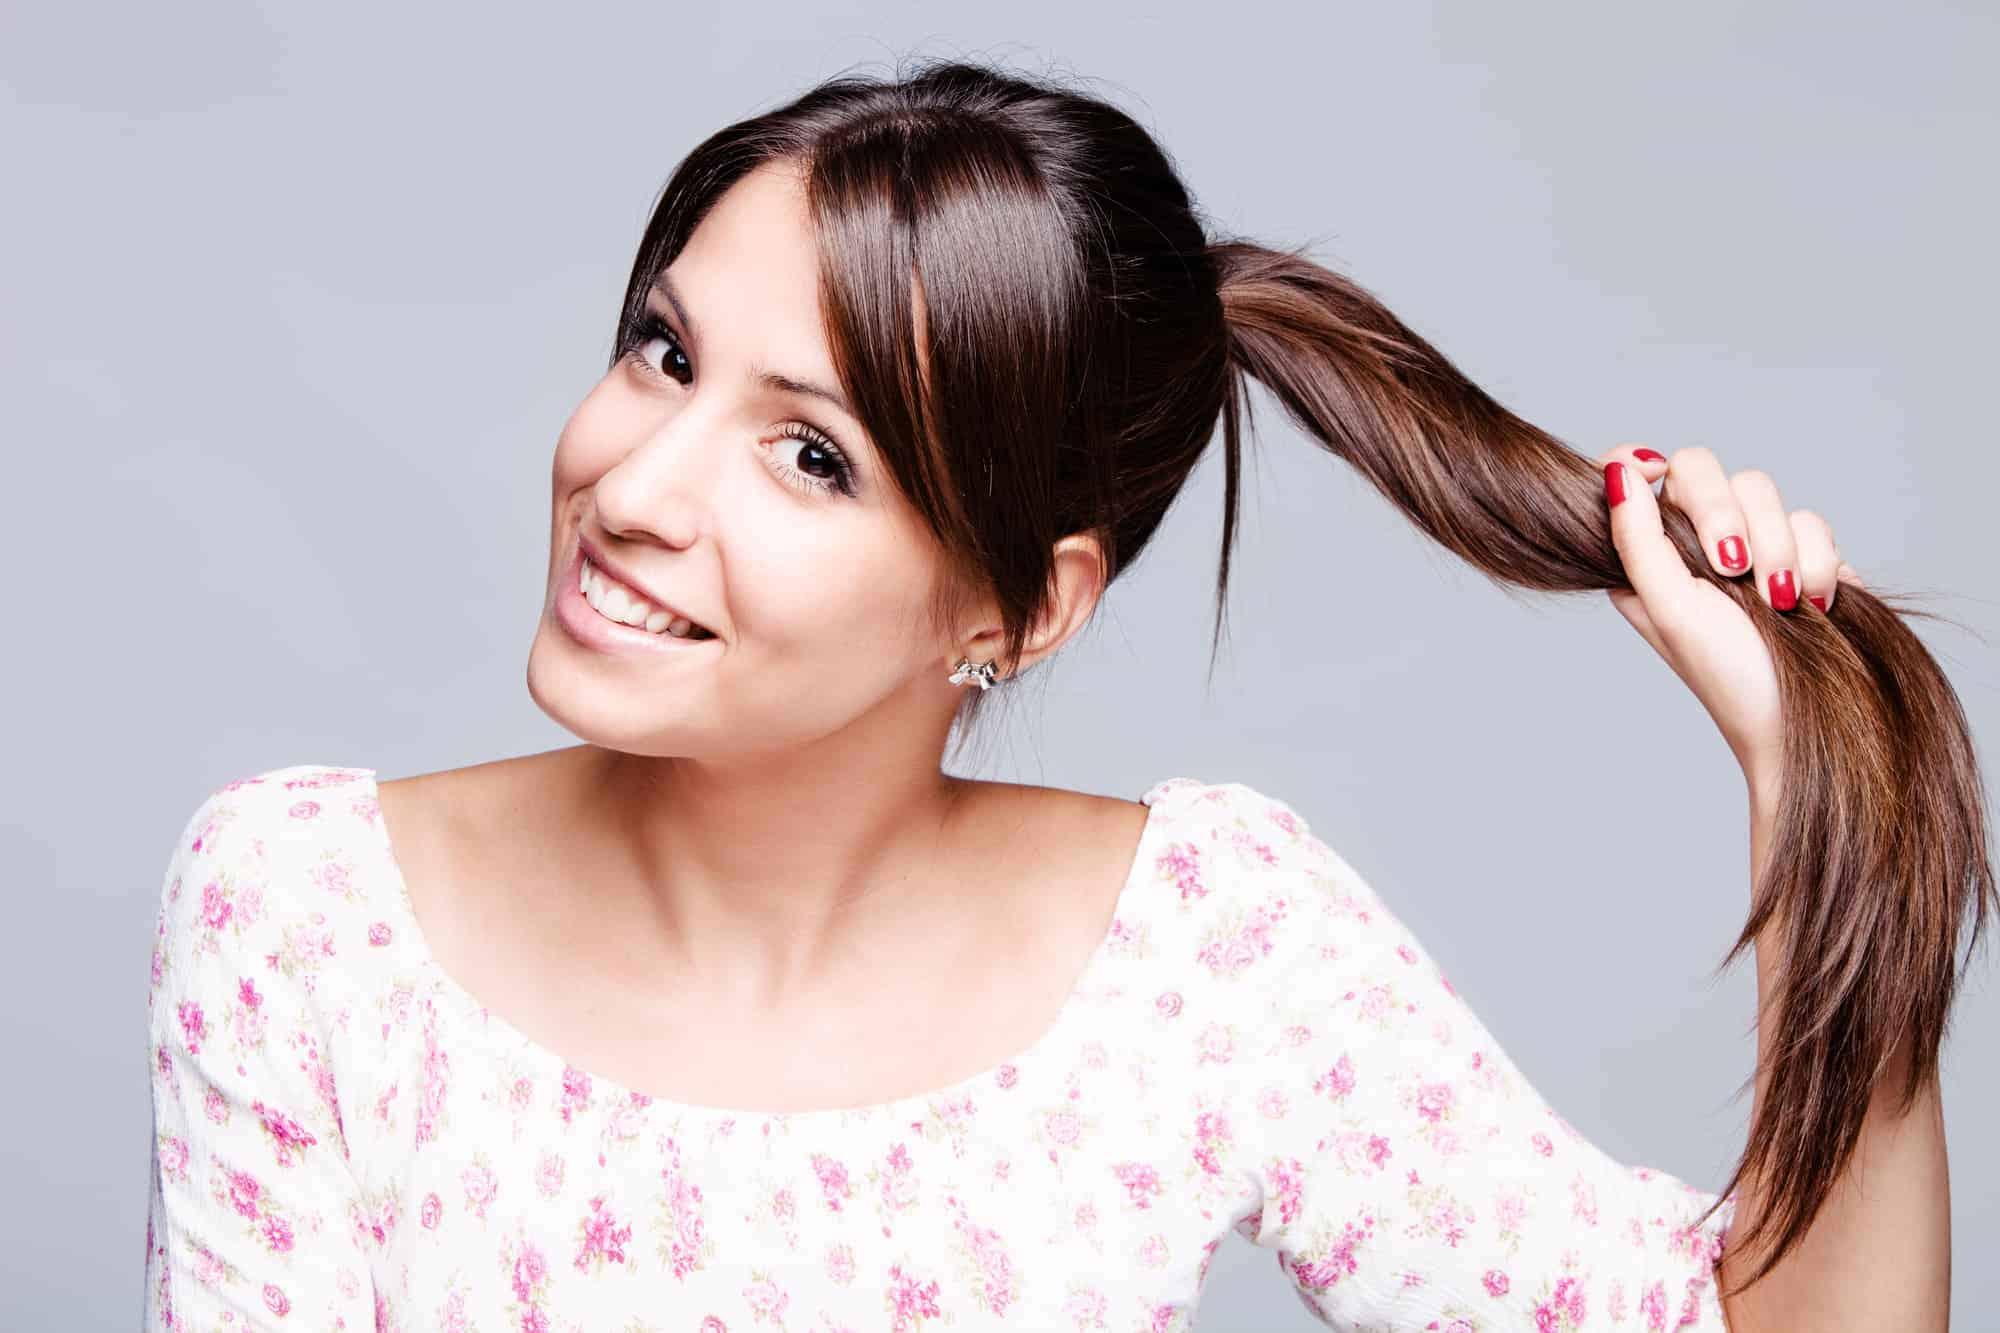 smiling girl hold her long shiny hair